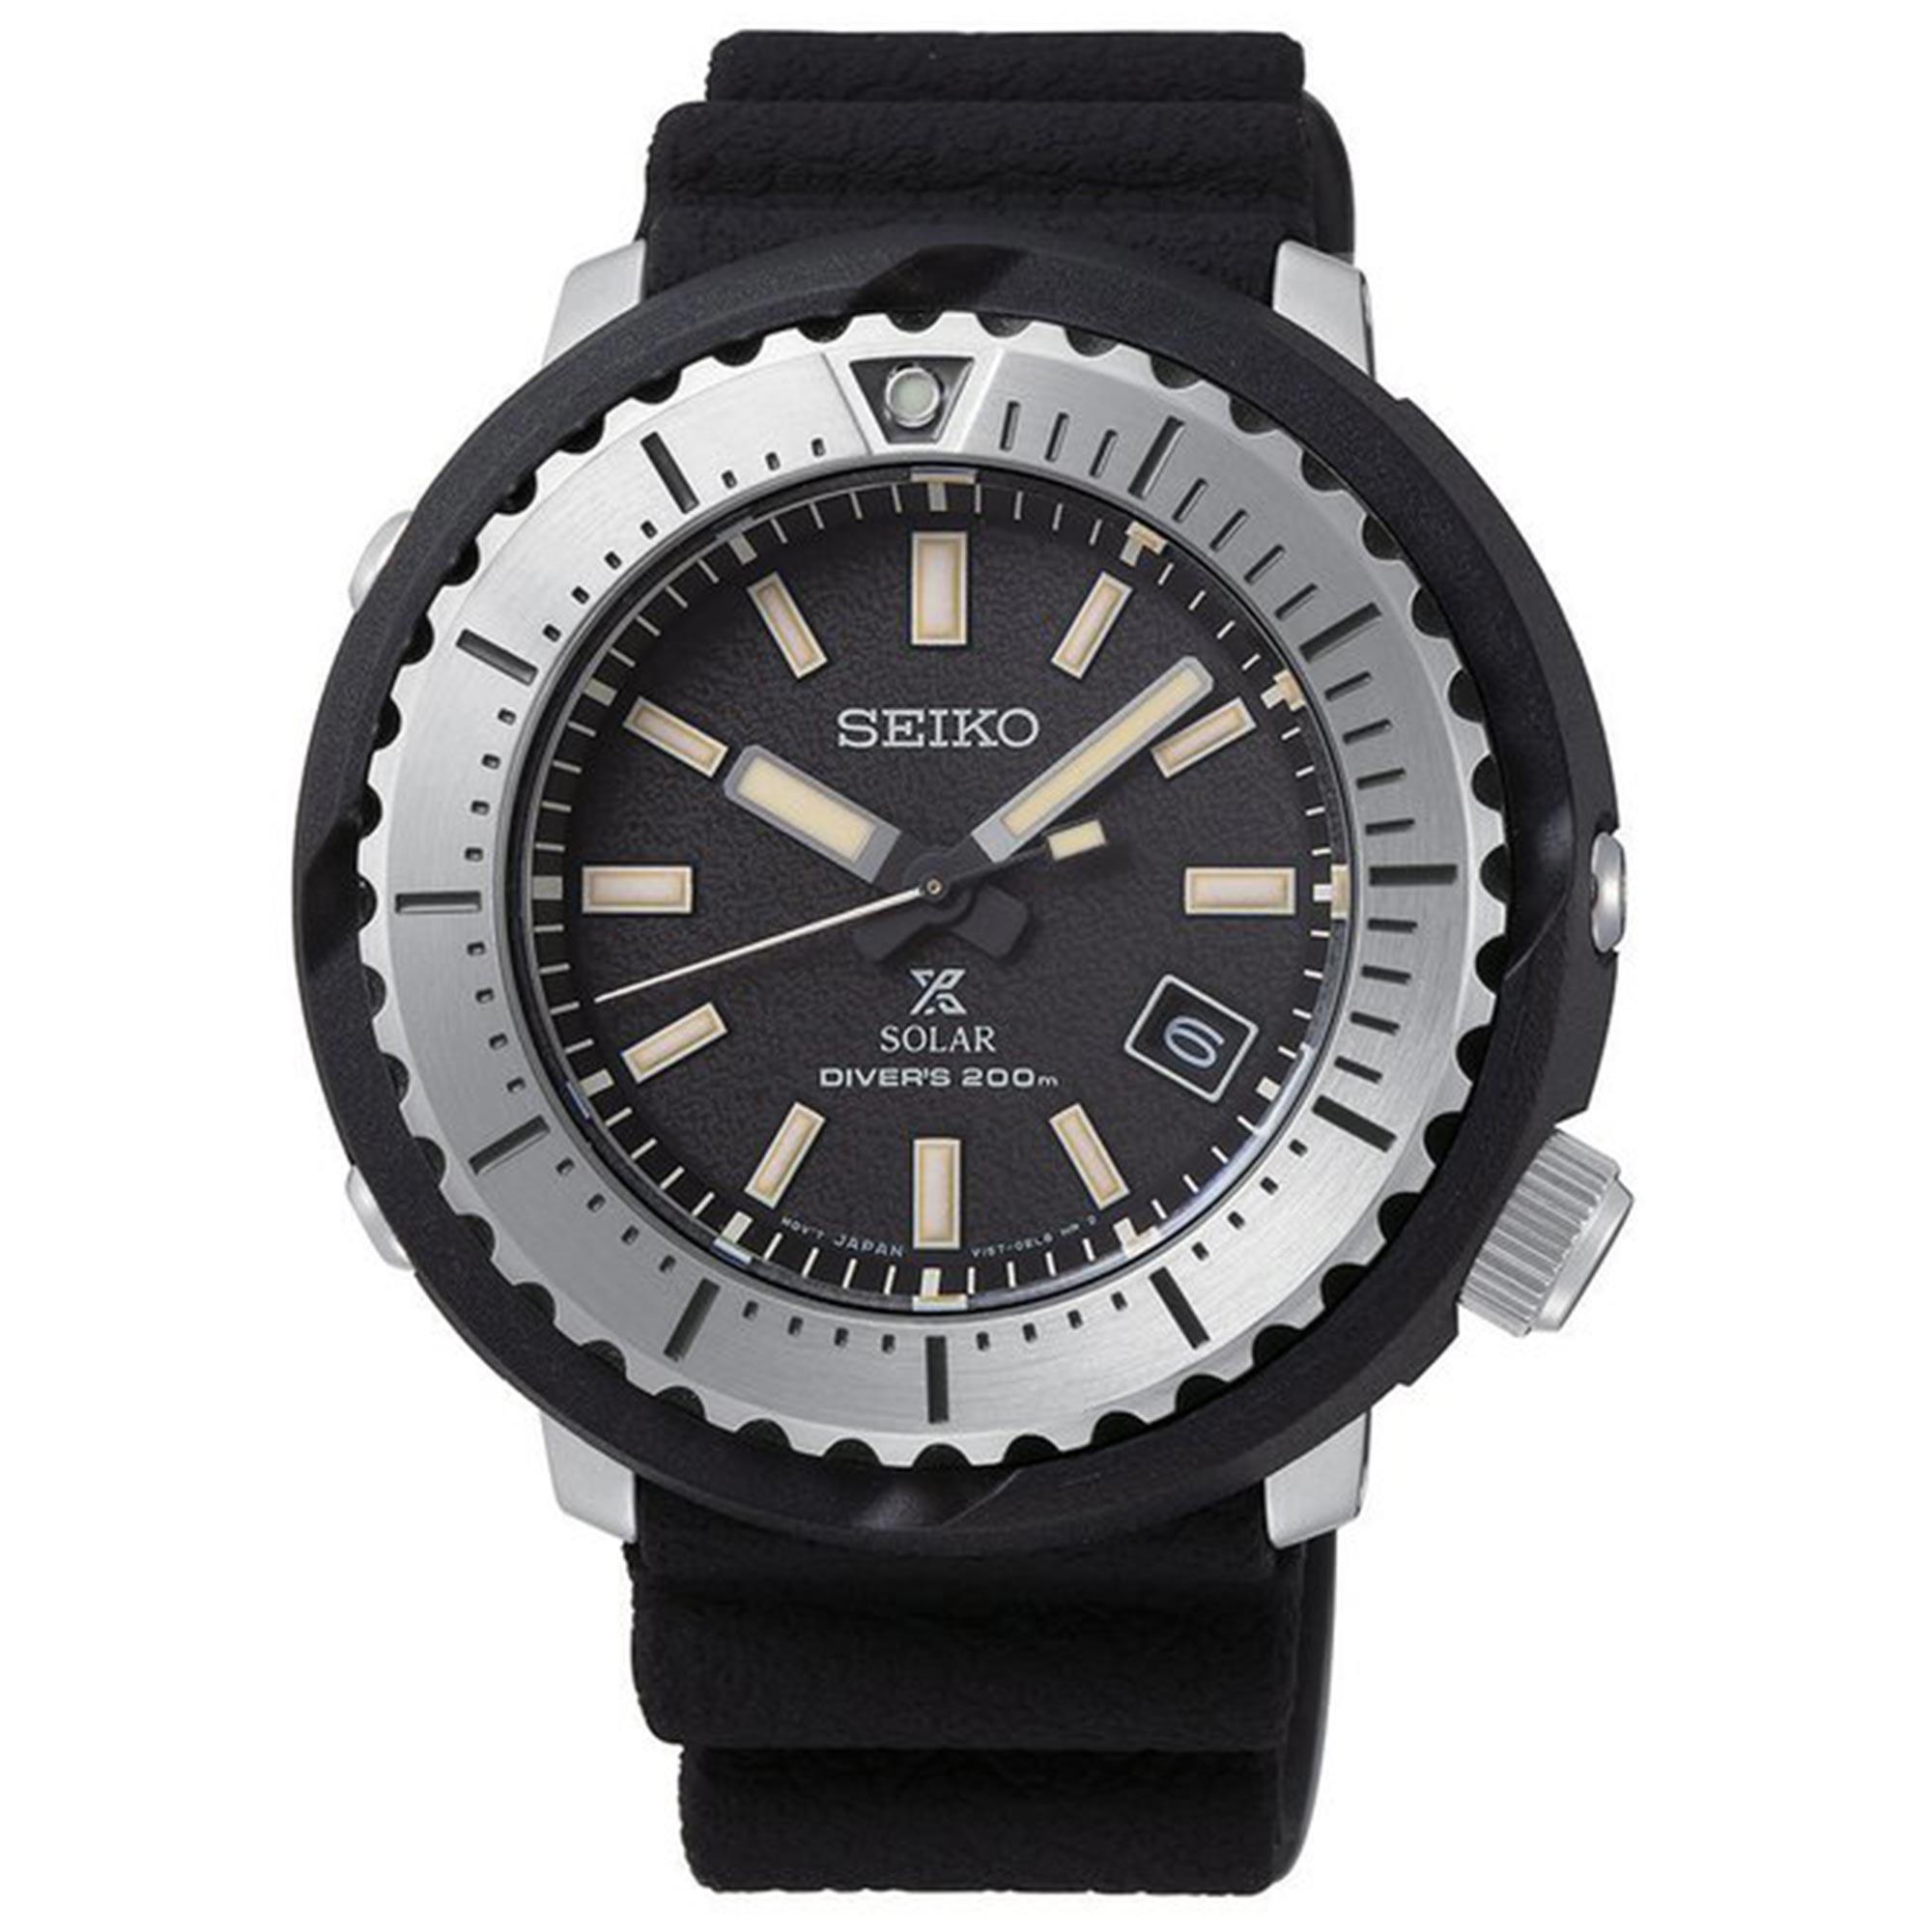 Seiko Prospex Street Series Solar Black Dial 'Tuna Case' Silicone Strap Men's Watch SNE541P1 RRP £340